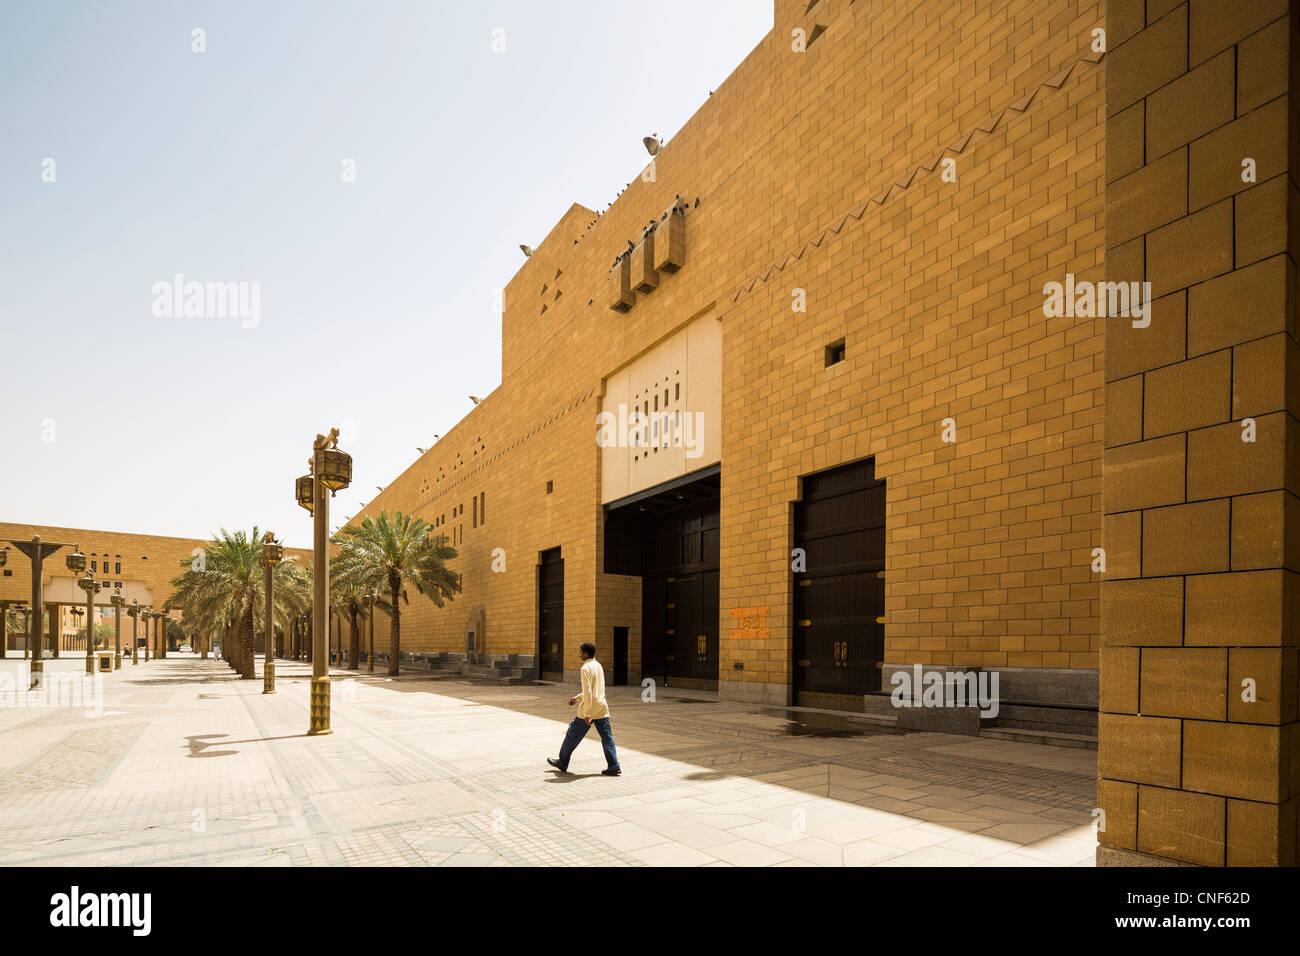 Qasr al-Hukm, al-Dira, Riyadh, Saudi Arabia - Stock Image